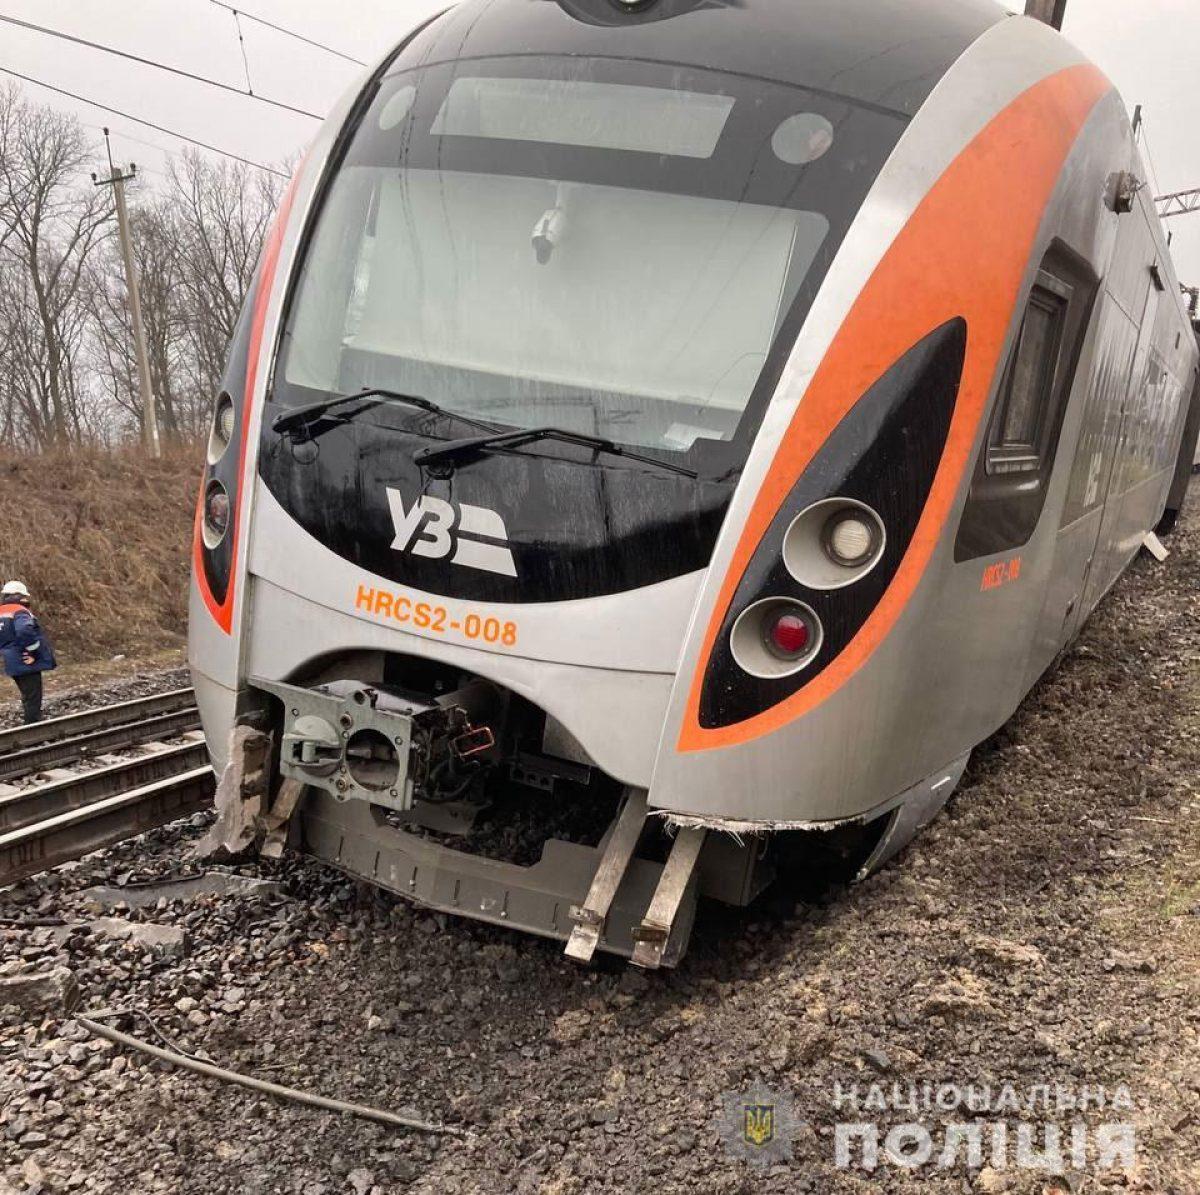 Появилось видео момента аварии Интерсити под Запорожьем